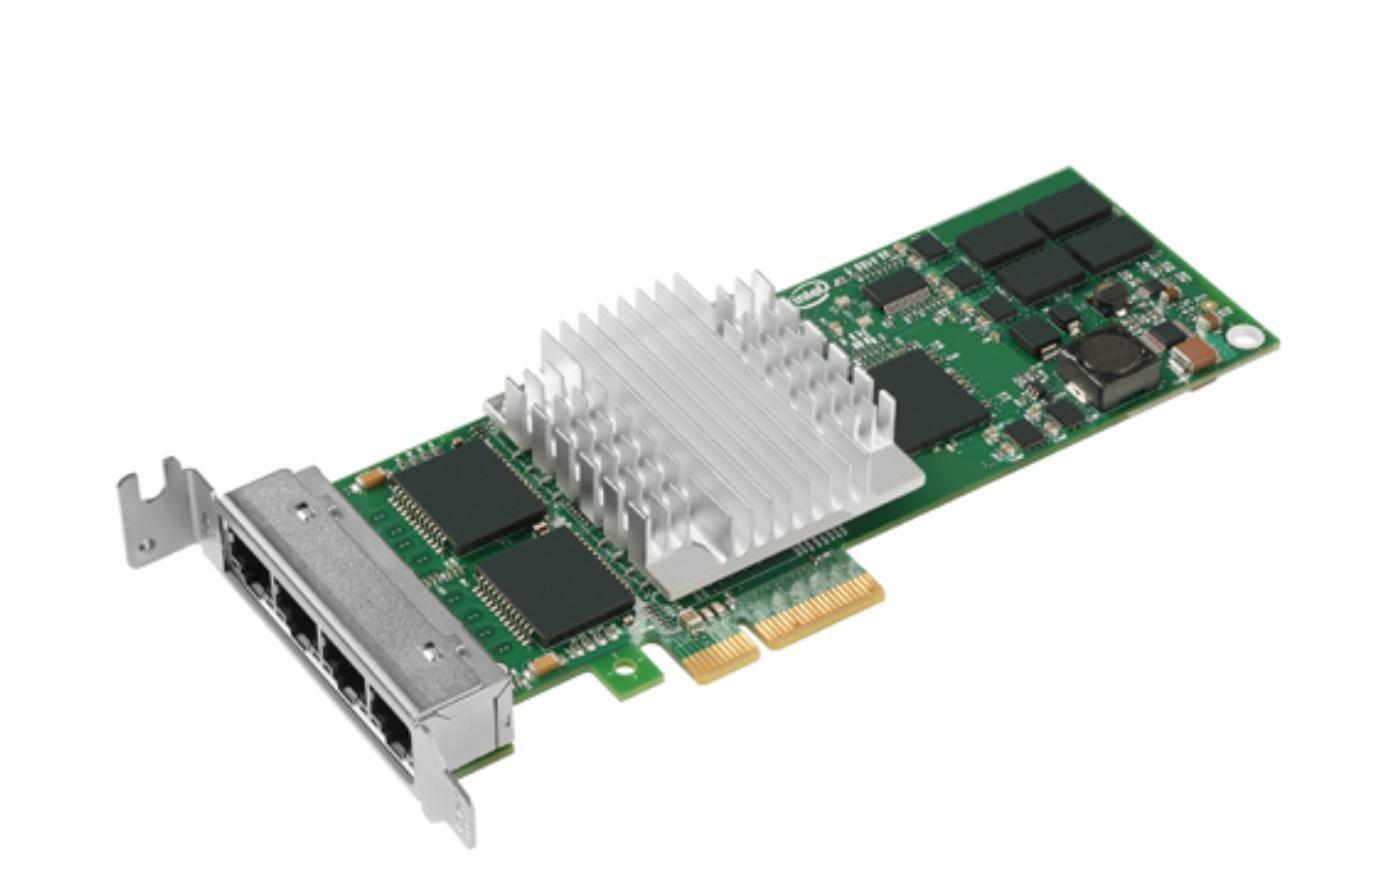 Intel EXPI9404PTL - NIC EXPI9404PTLPAK1 1000BASET PCIE by Intel